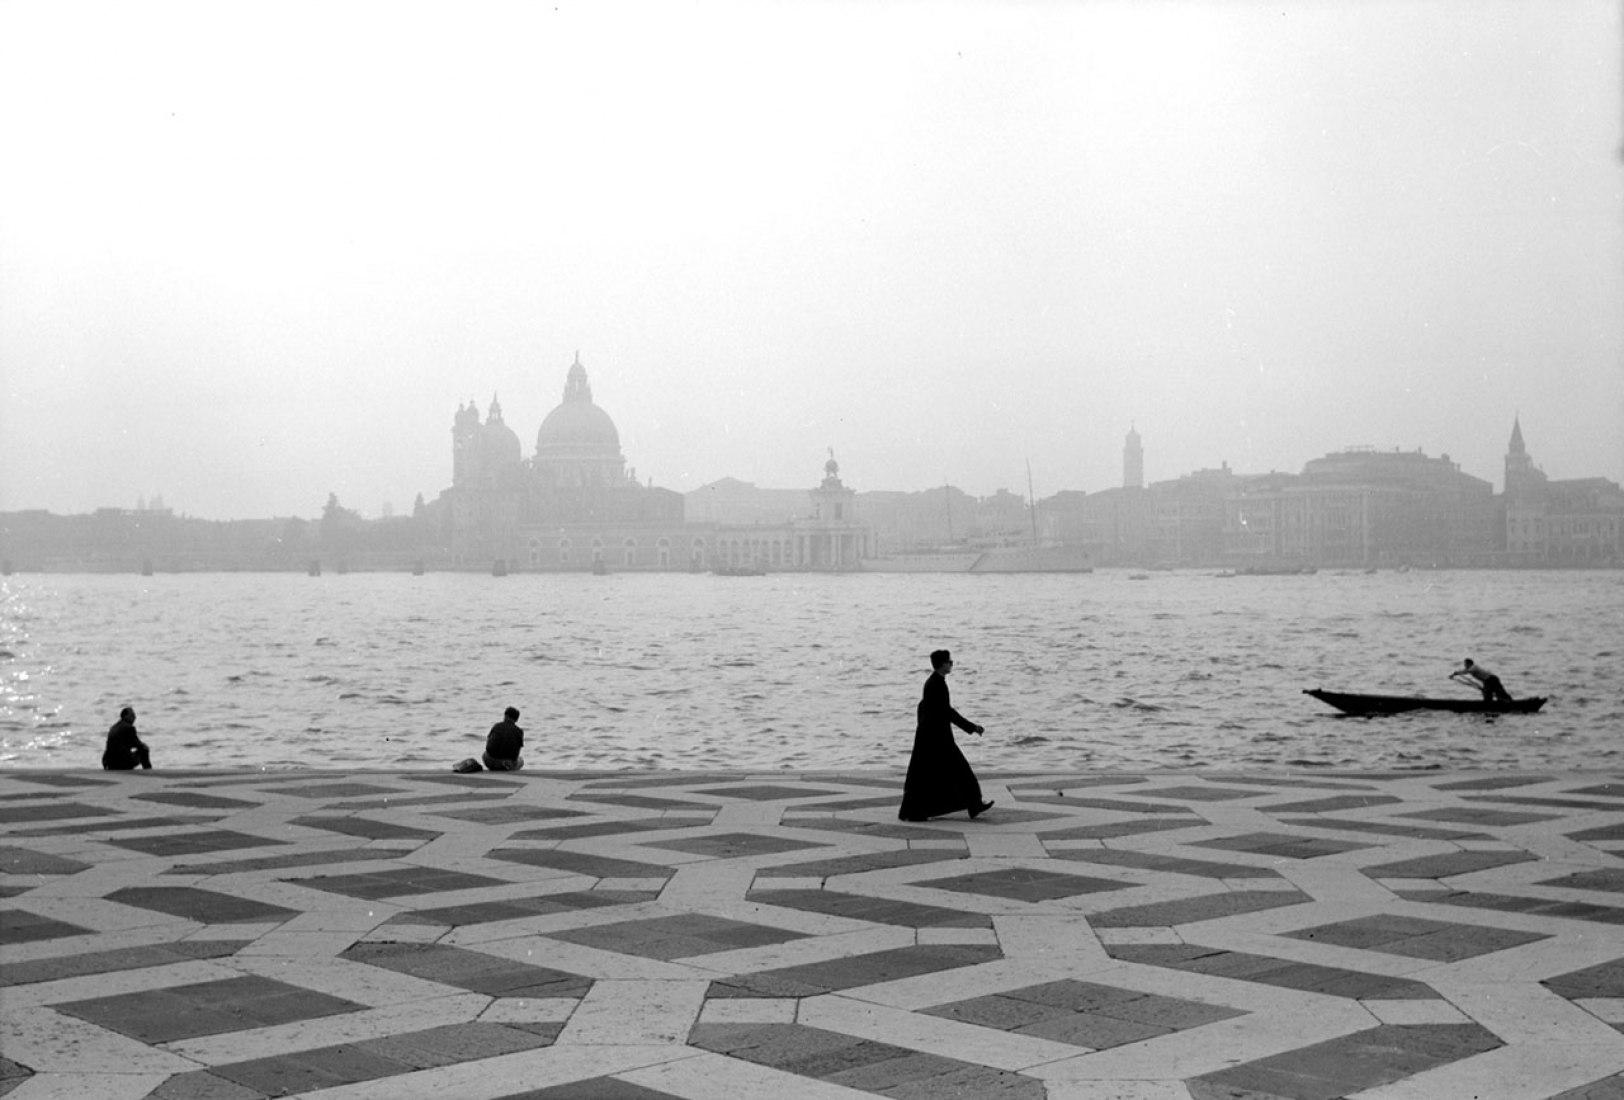 Campo San Giogio Maggiore, Venecia, 1961. Fotografía © Edwin Smith. Imagen Cortesía de la RIBA Library Photographs Collection.